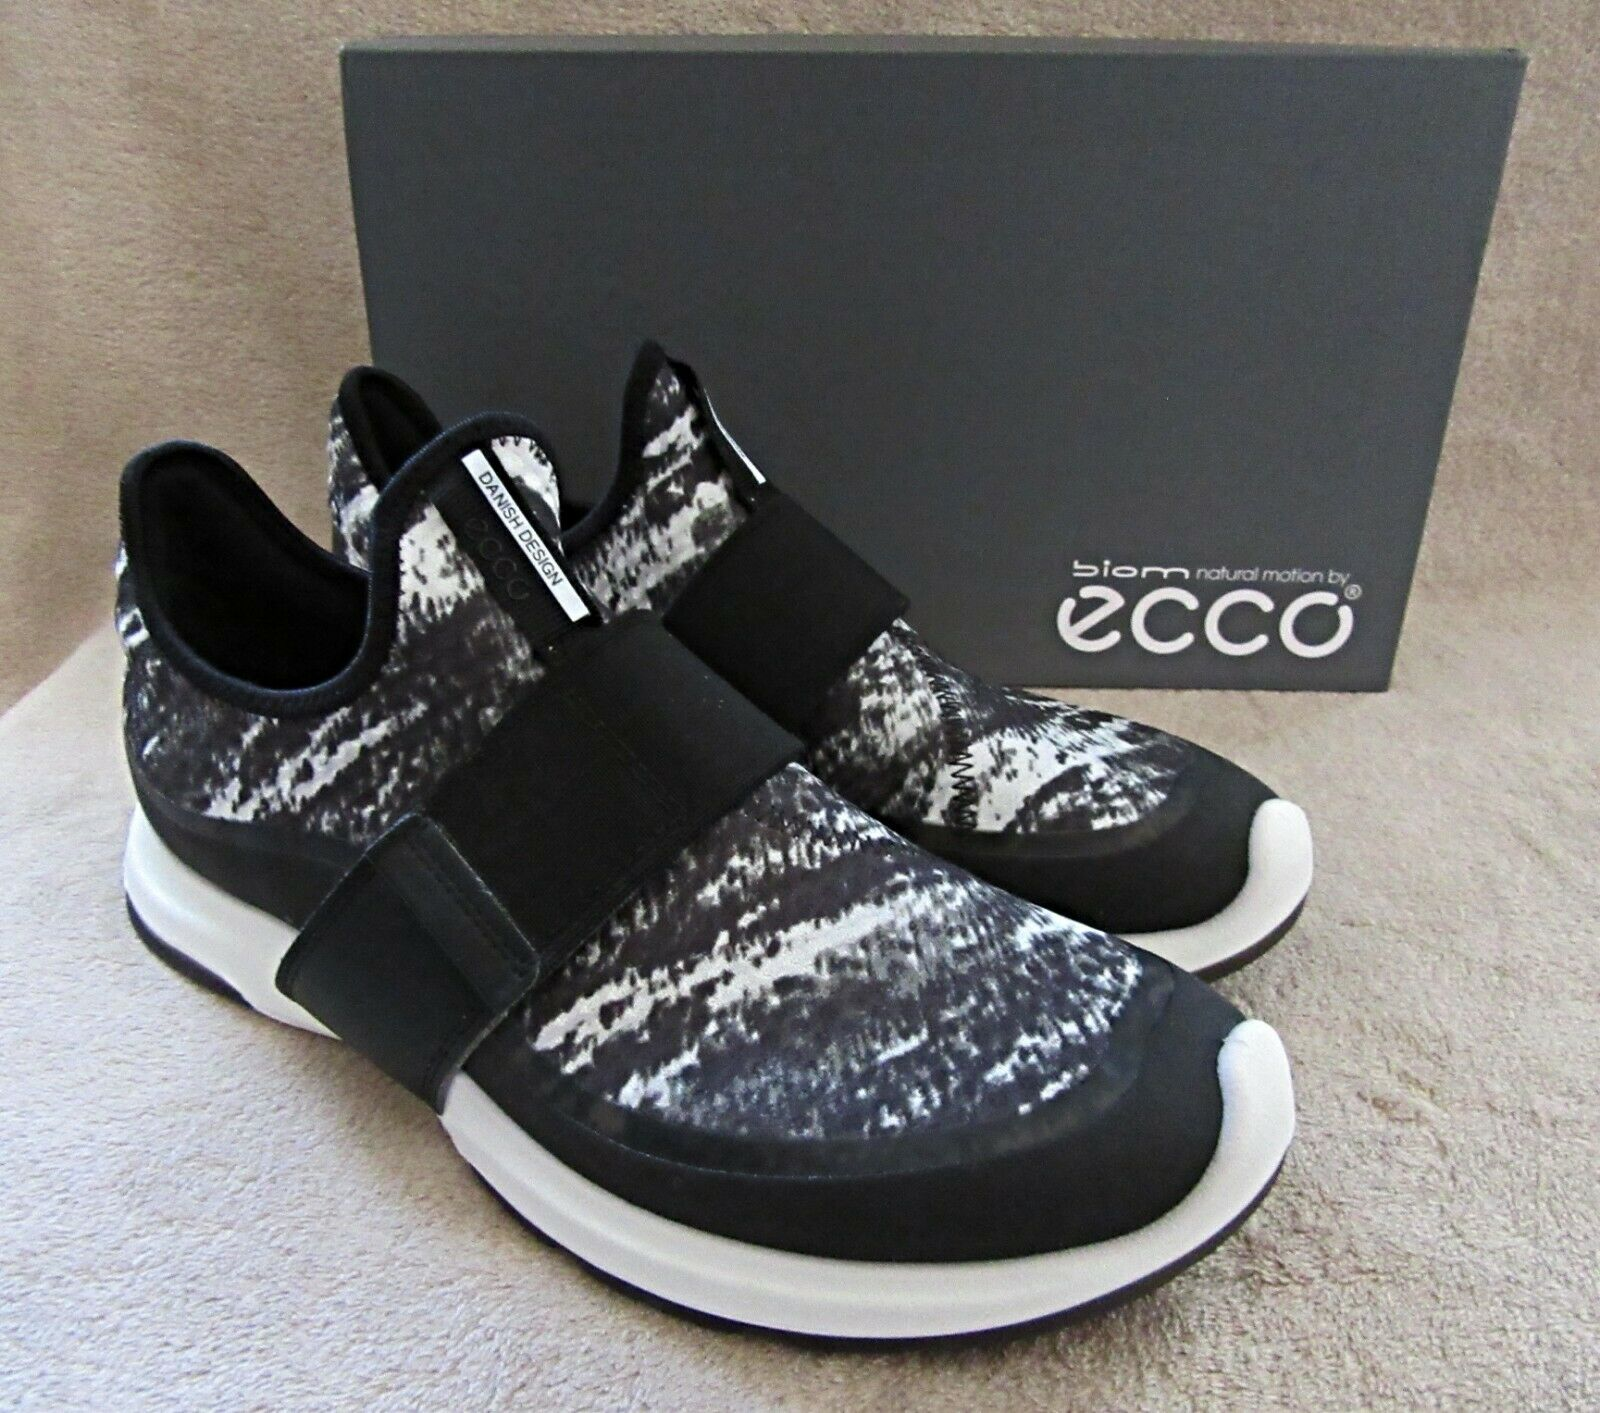 ECCO Biom Amrap Strap nero & bianca Fashion scarpe da ginnastica scarpe US 8 - 8.5 EUR 39 NWB